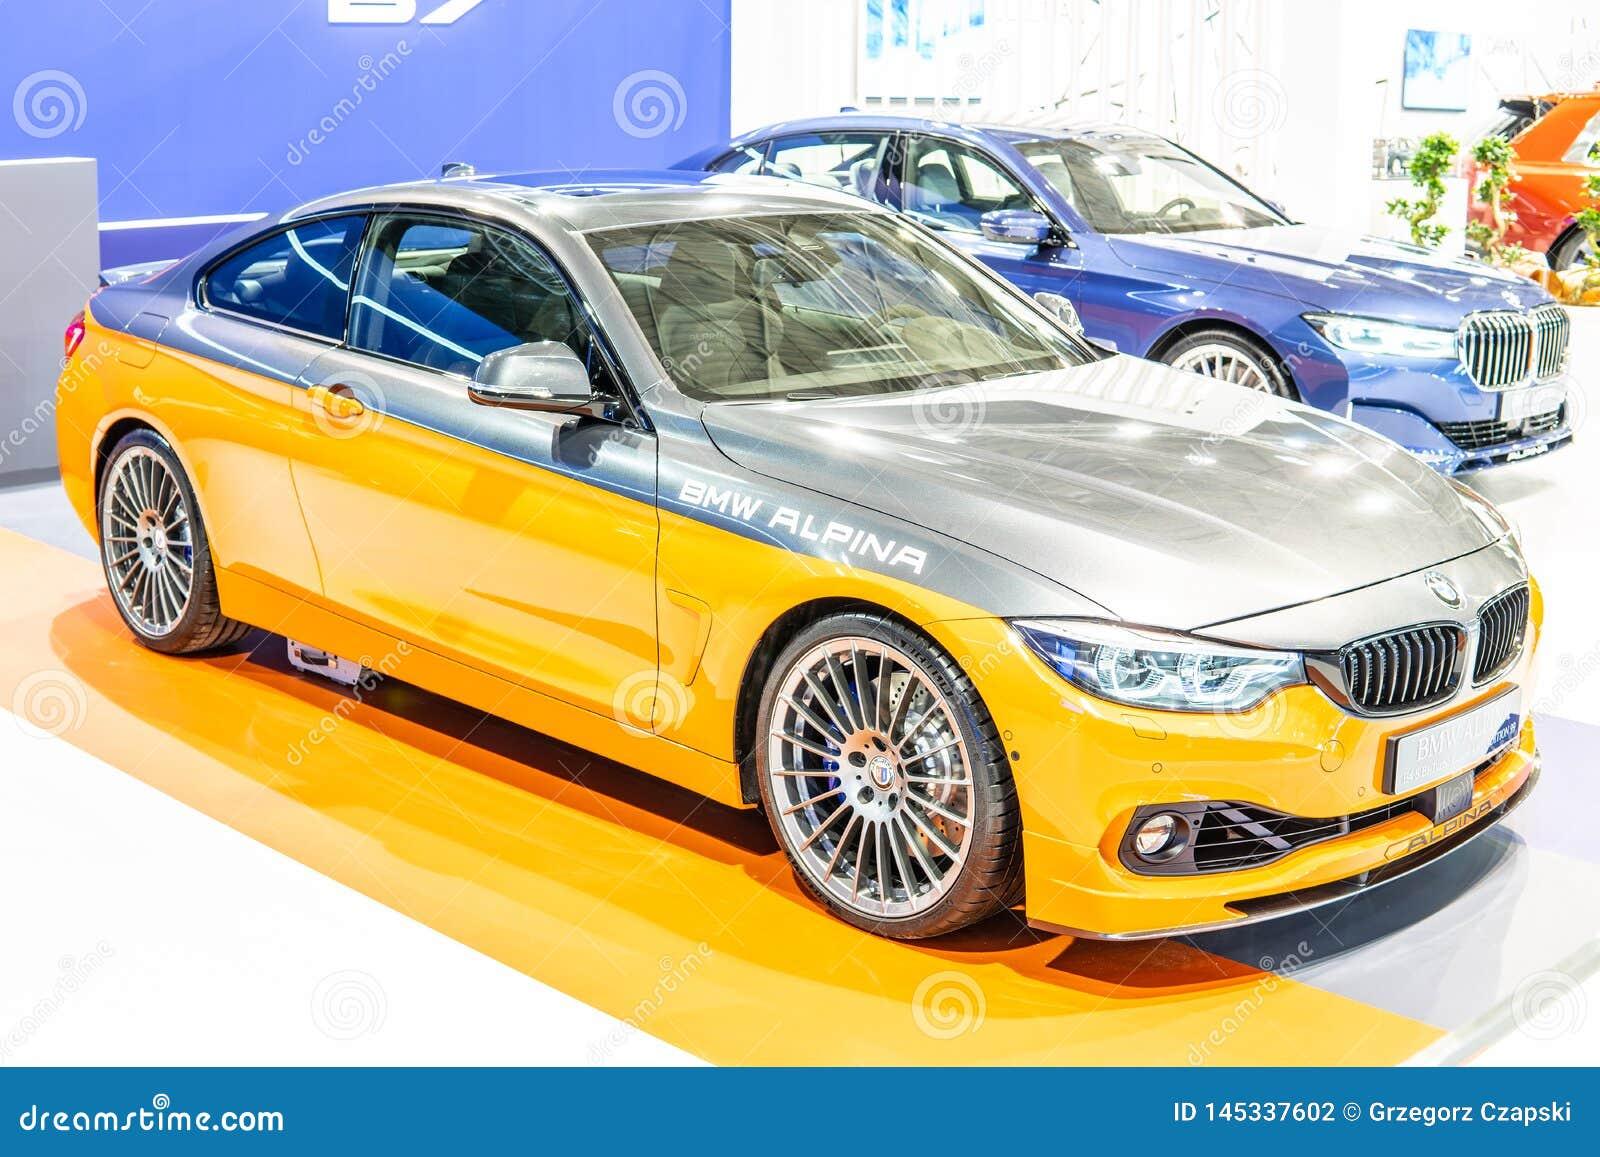 BMW ALPINA B4 S BITURBO Edition99, Alpina Burkard Bovensiepen GmbH develops and sells high-performance versions of BMW cars